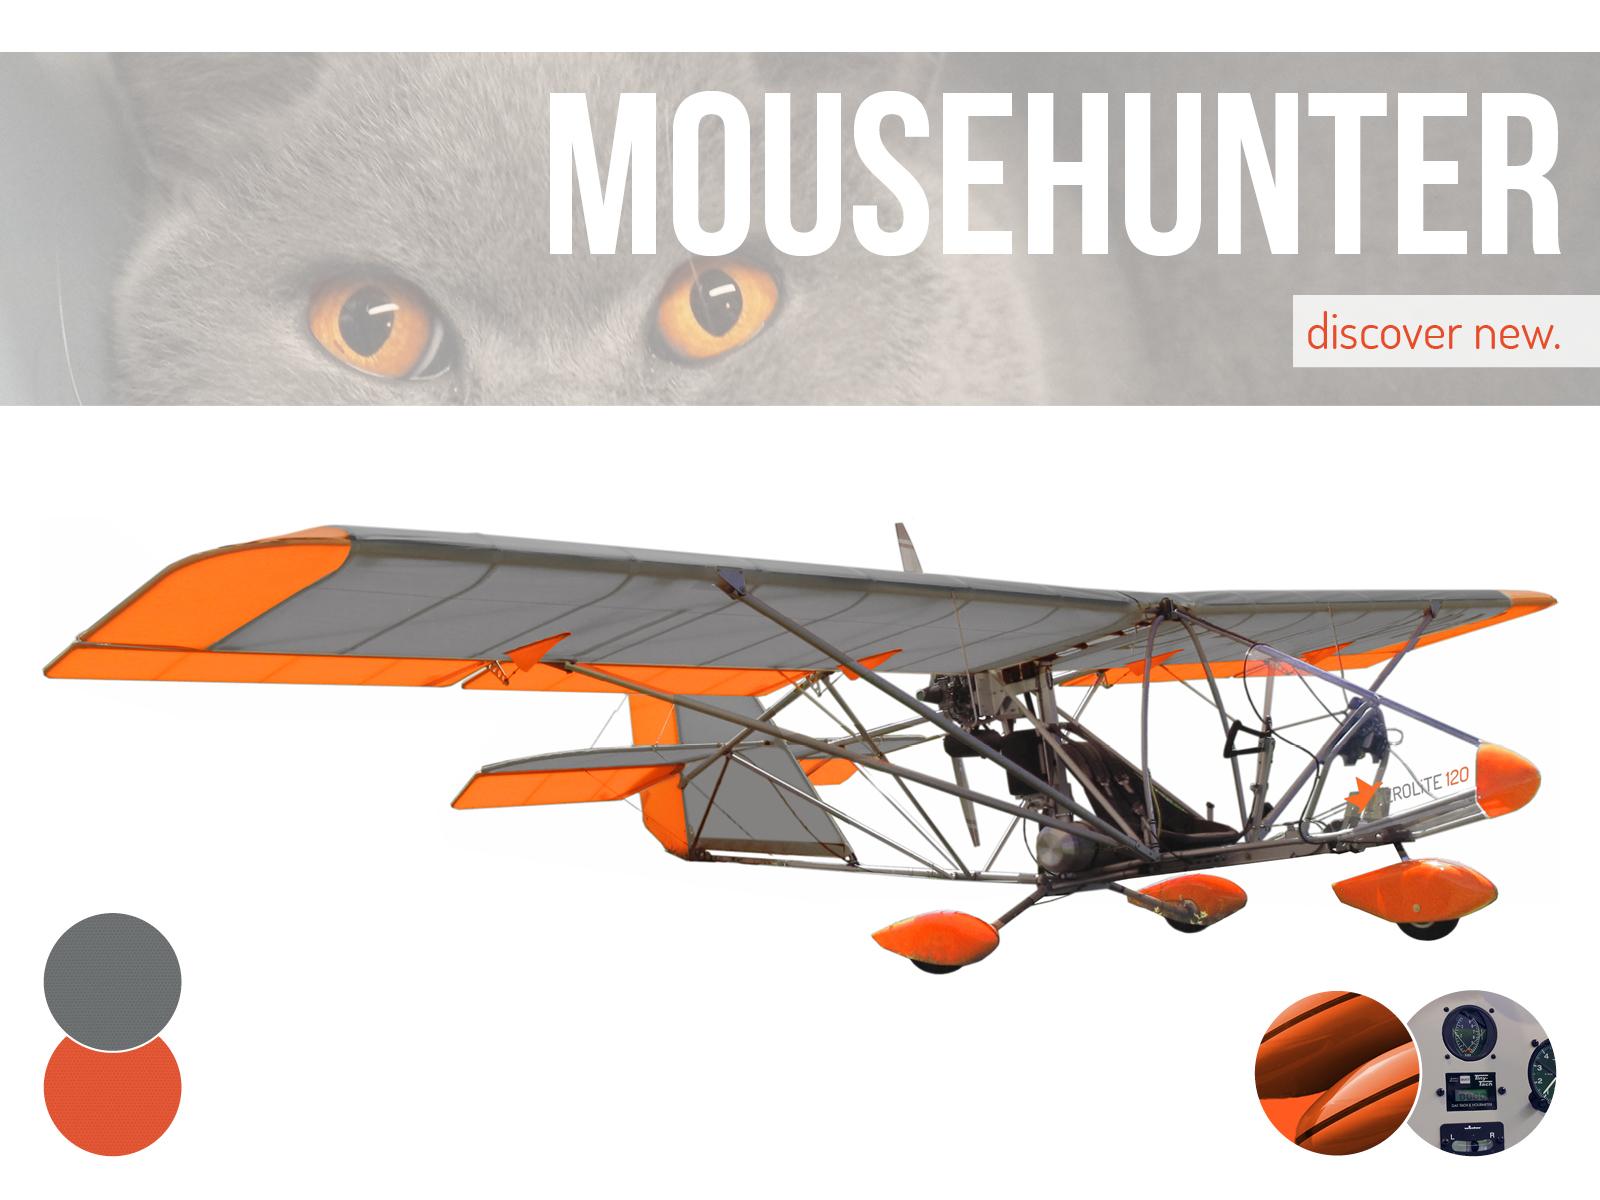 Mousehunter